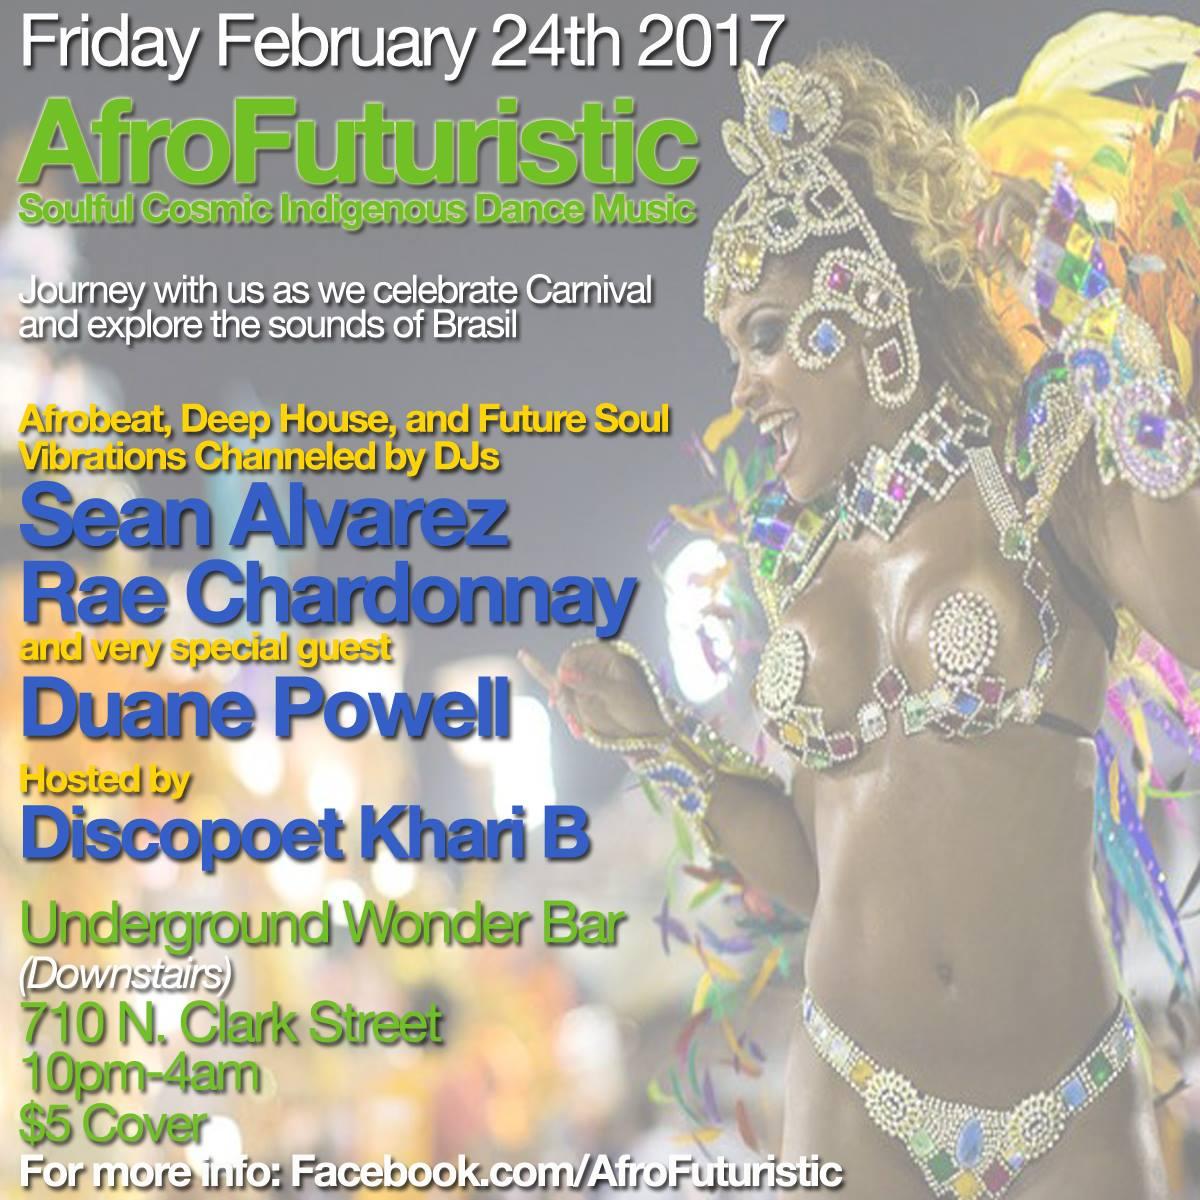 Friday 2/24: AfroFuturistic Celebrates Brasilian Carnival